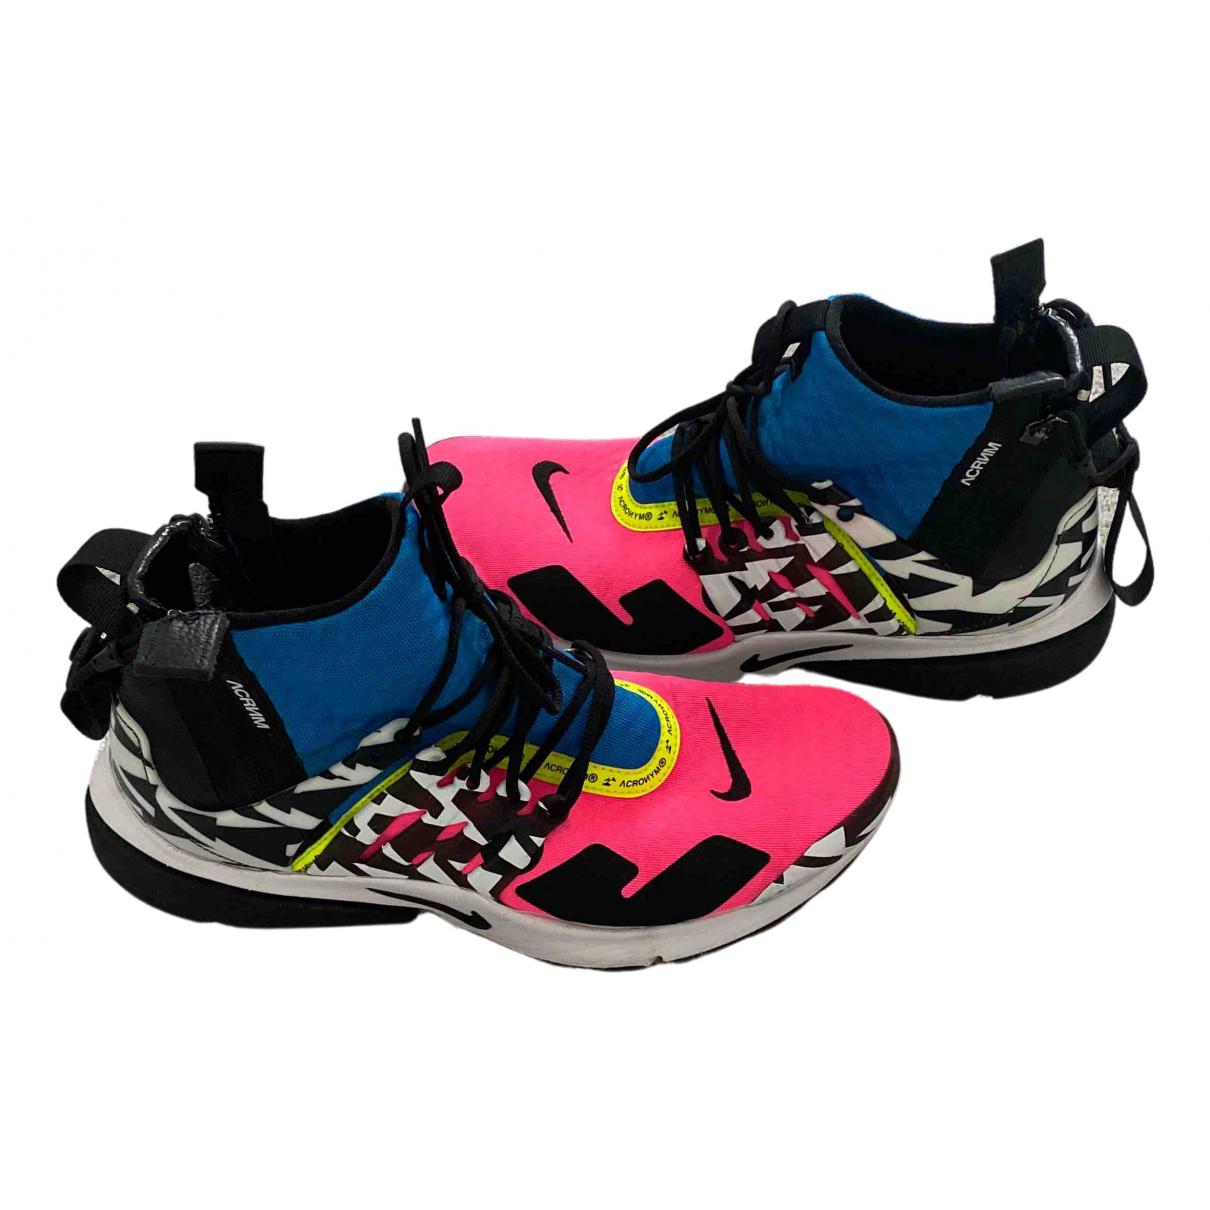 Nike X Acronym Air Presto Sneakers in  Bunt Leinen